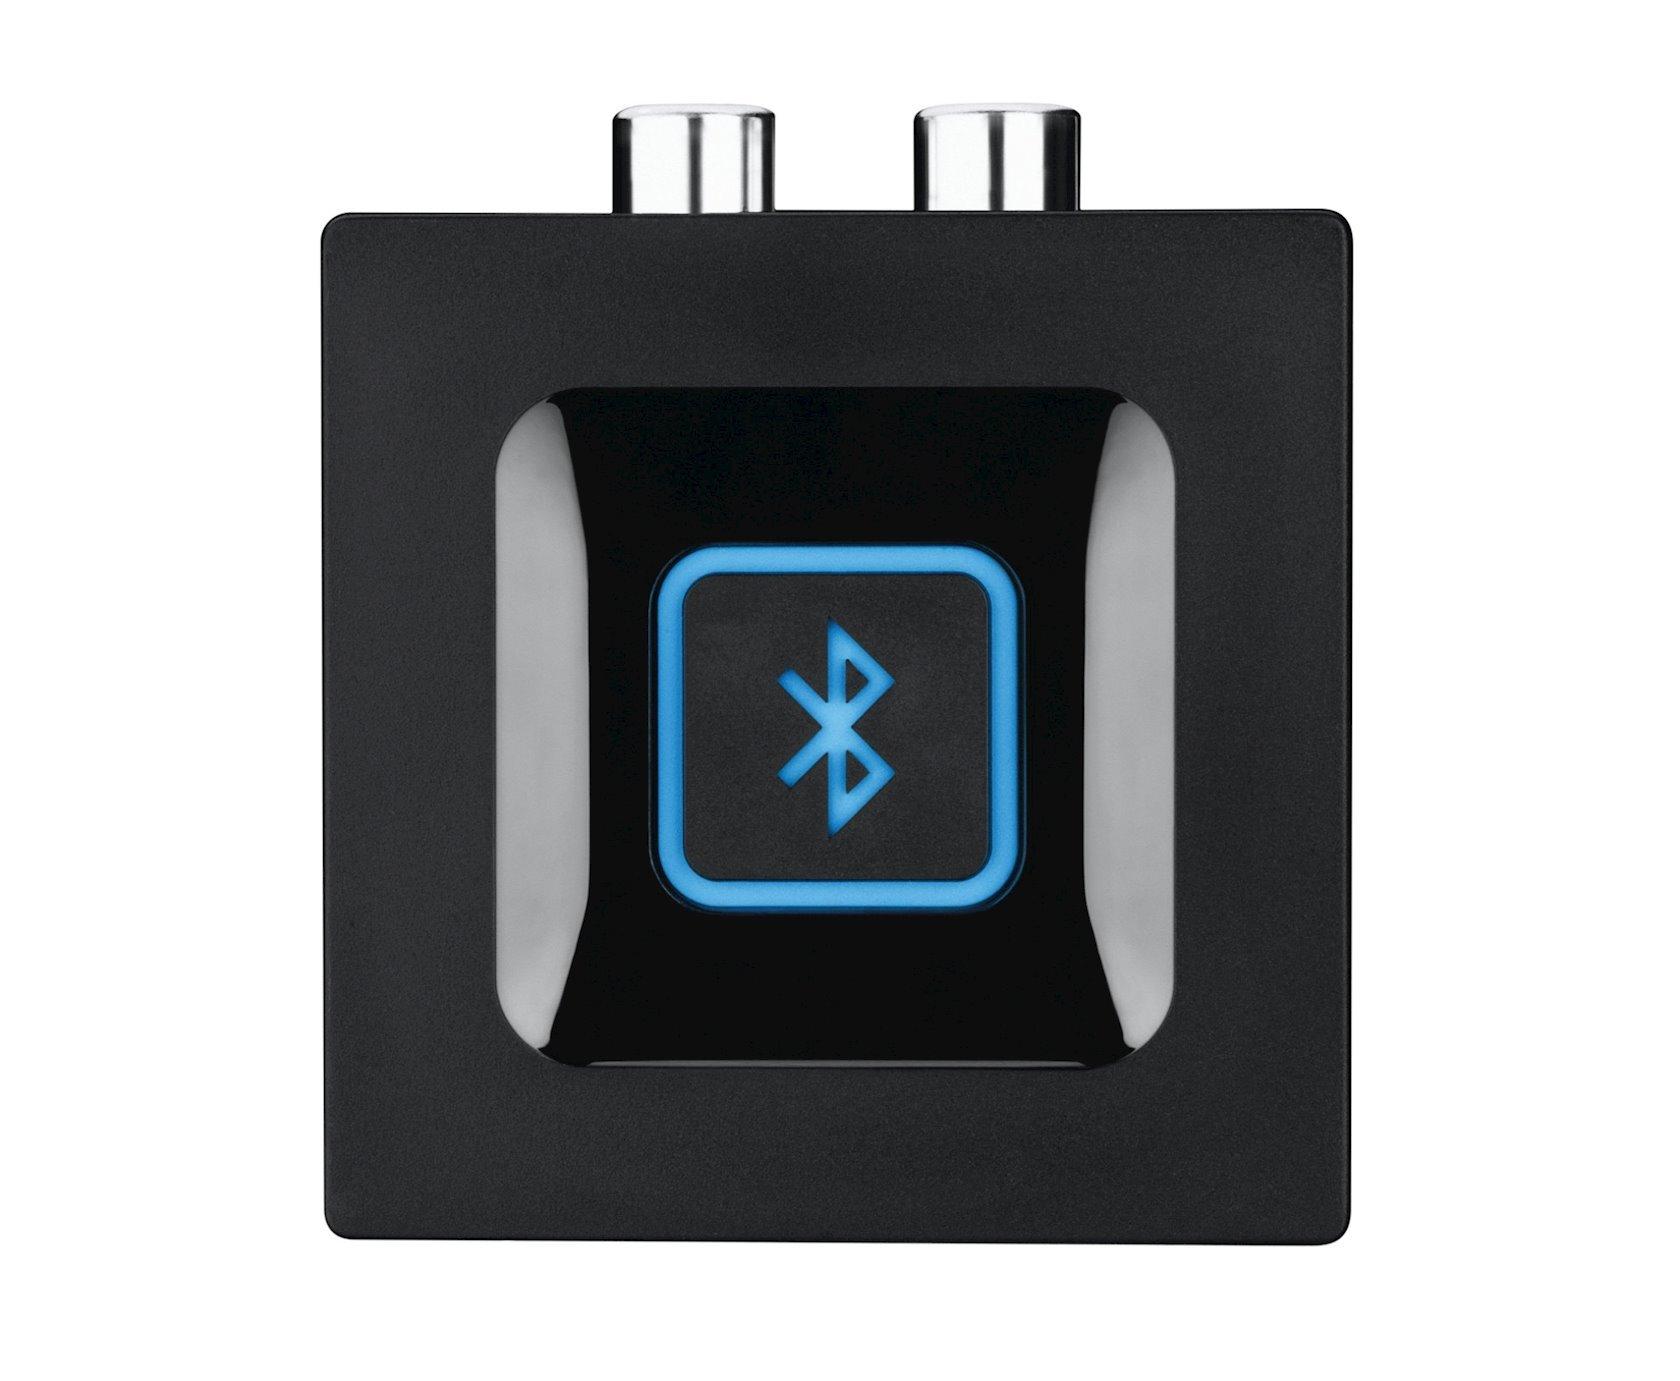 Bluetooth Audio Adapter Logitech Bluebox II 933 980-000912-N